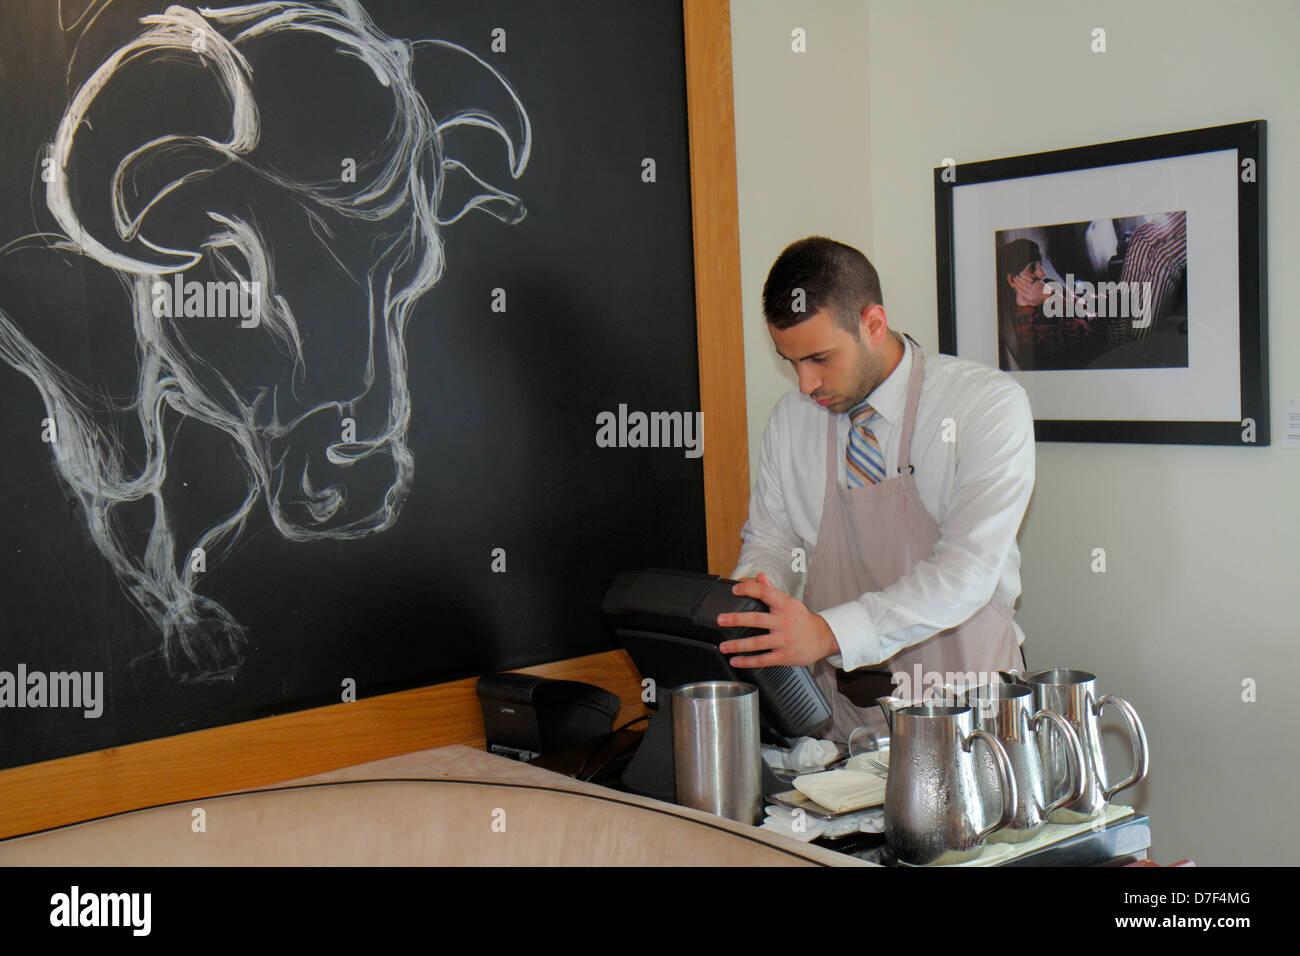 Miami Beach Florida Ocean Drive Betsy Ross Hotel BLT Steak restaurant Hispanic man waiter manager cash register Stock Photo